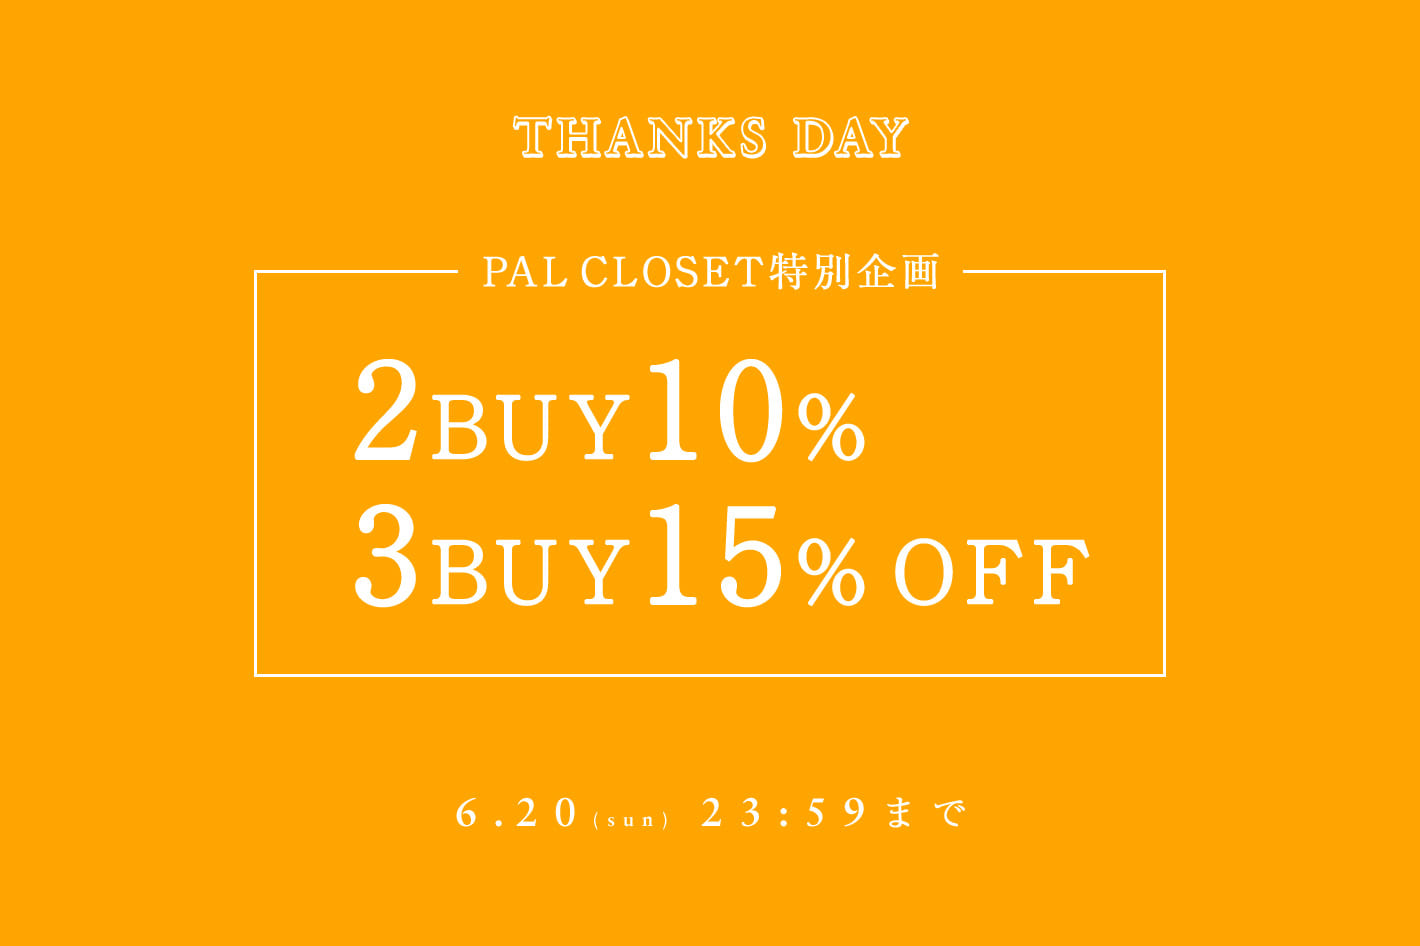 russet \THANKS DAY/PAL CLOSET特別企画 2BUY10%OFF 3BUY15%OFFキャンペーン開催